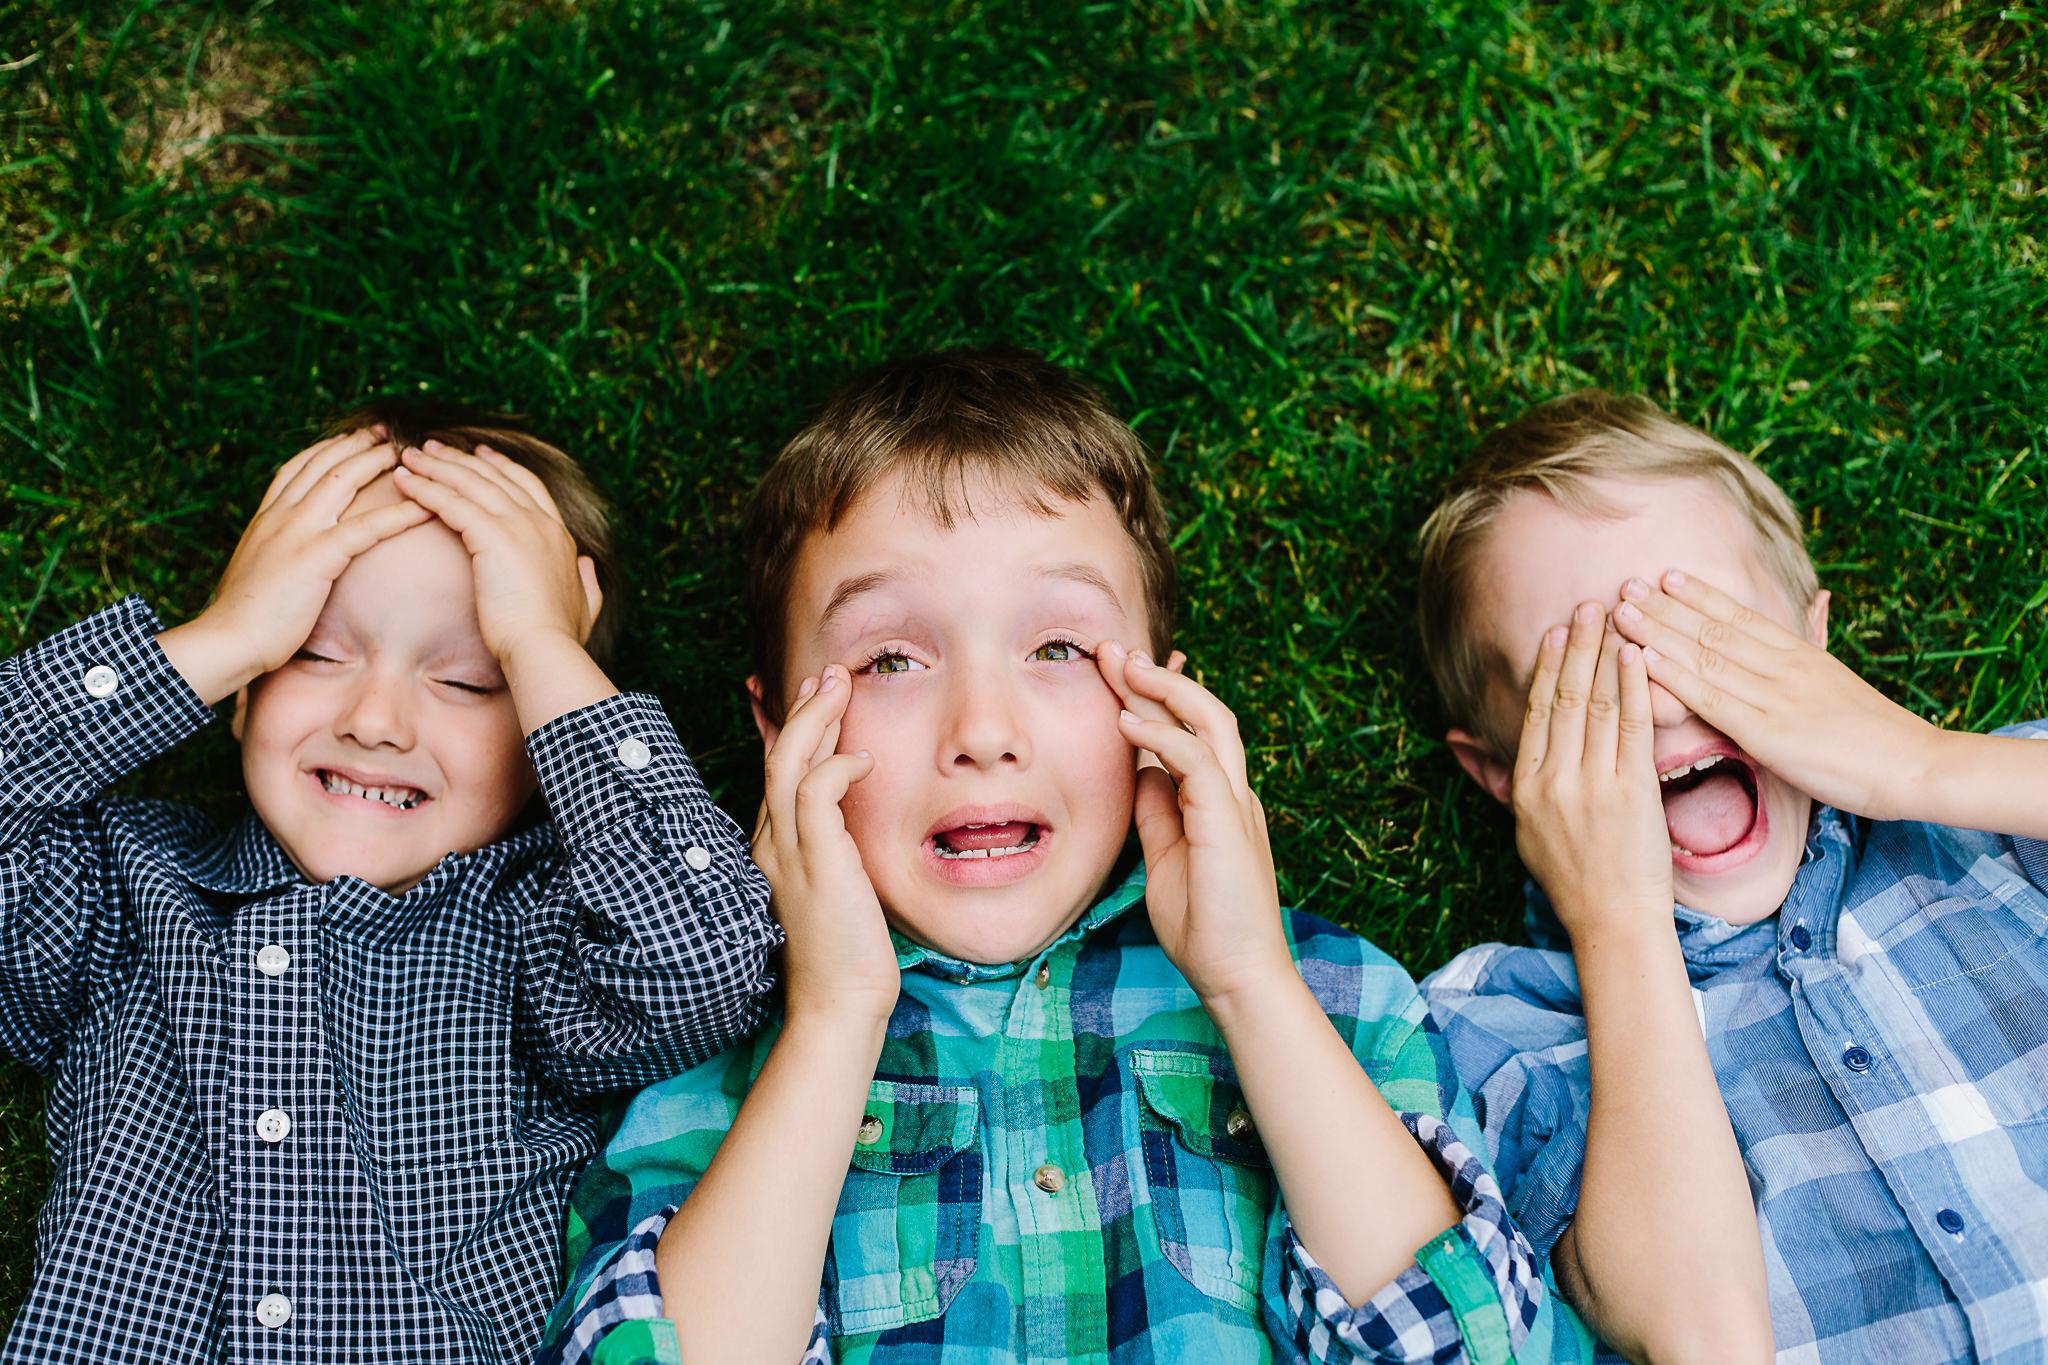 Chilliwack-Langley-Abbotsford-Family-Photographer.jpg